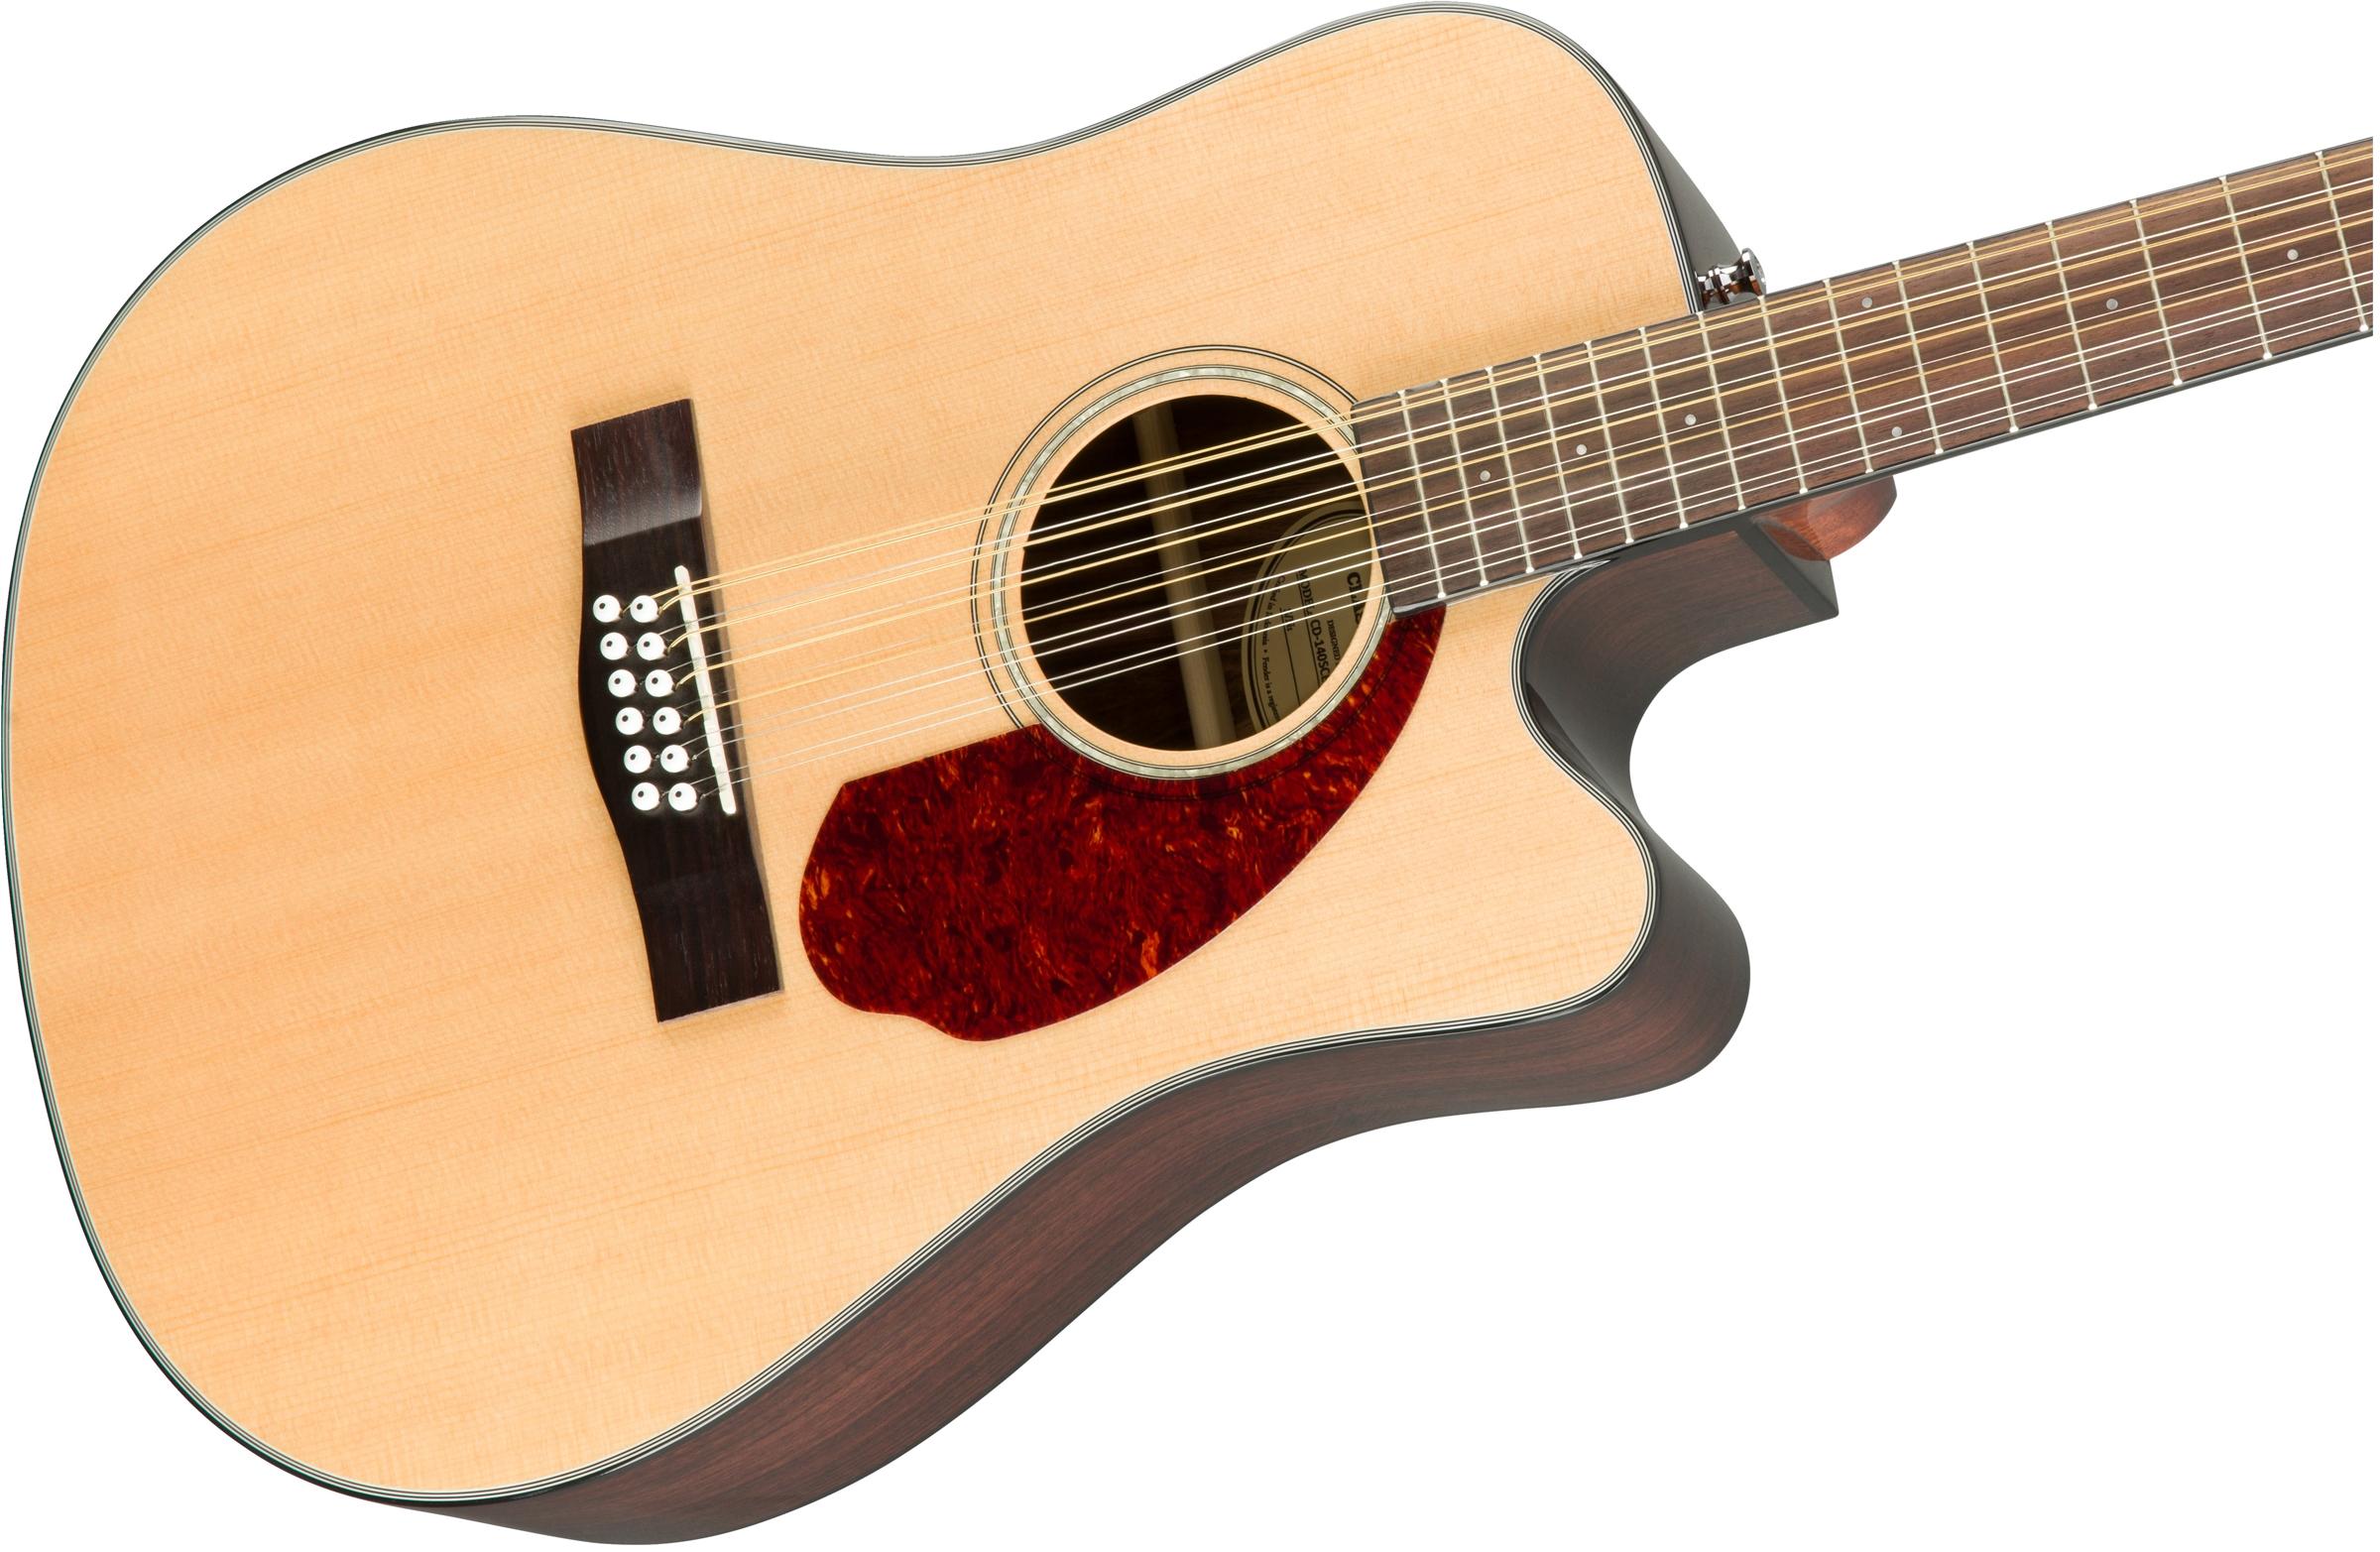 cd 140sce 12 string acoustic guitars 12 String Electric Fender Strat cd 140sce 12 string